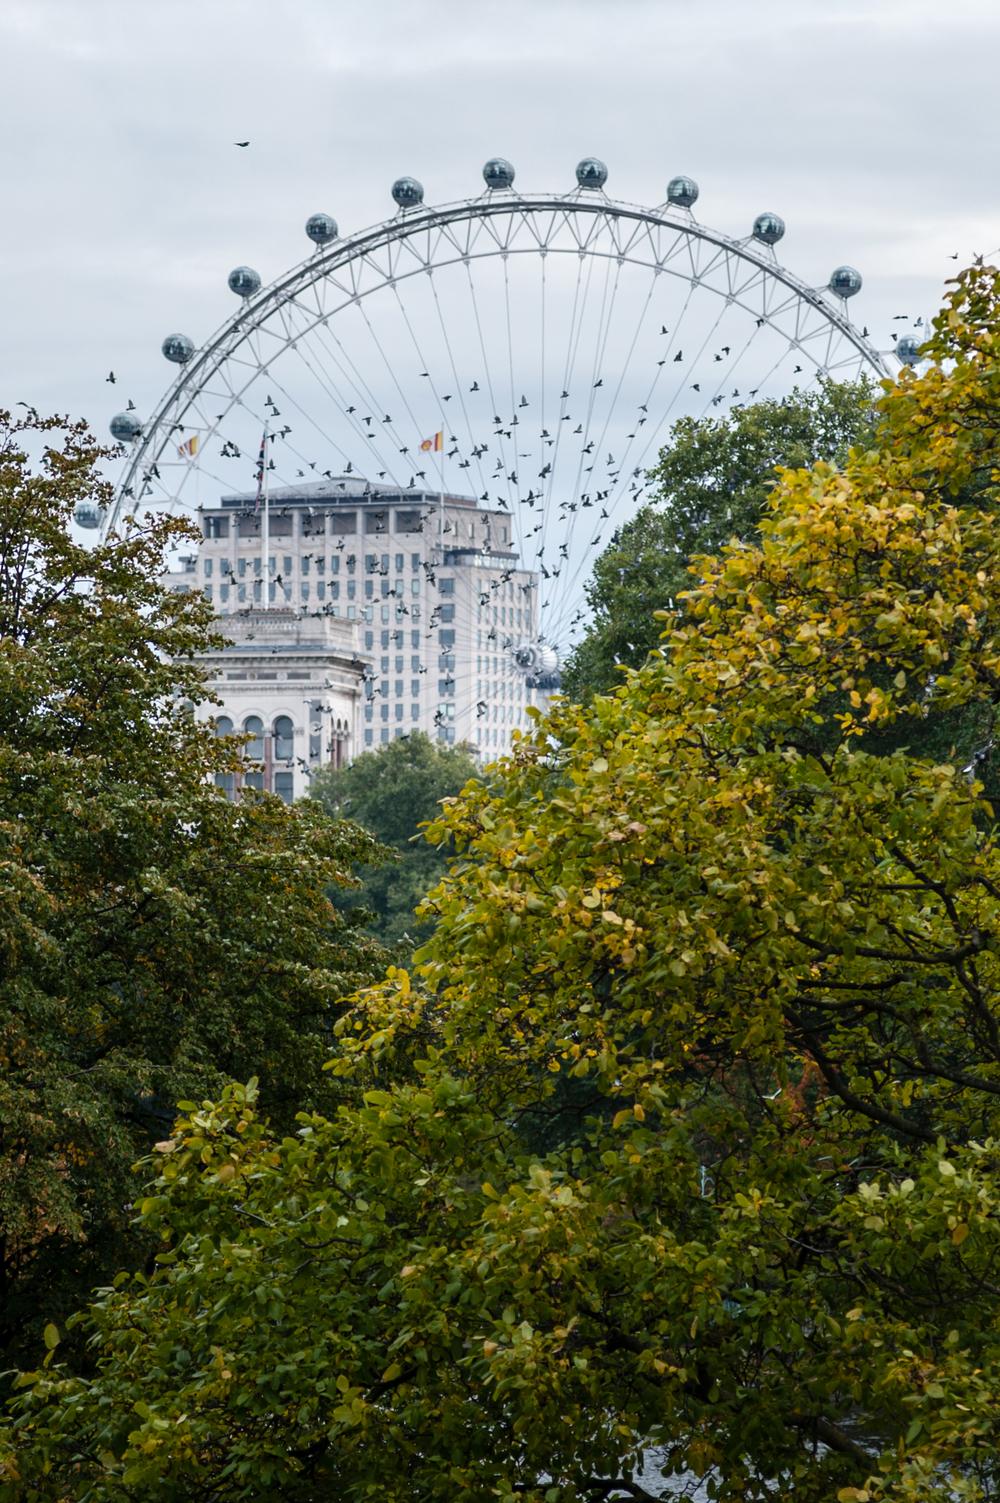 The London Eye - London, United Kingdom.